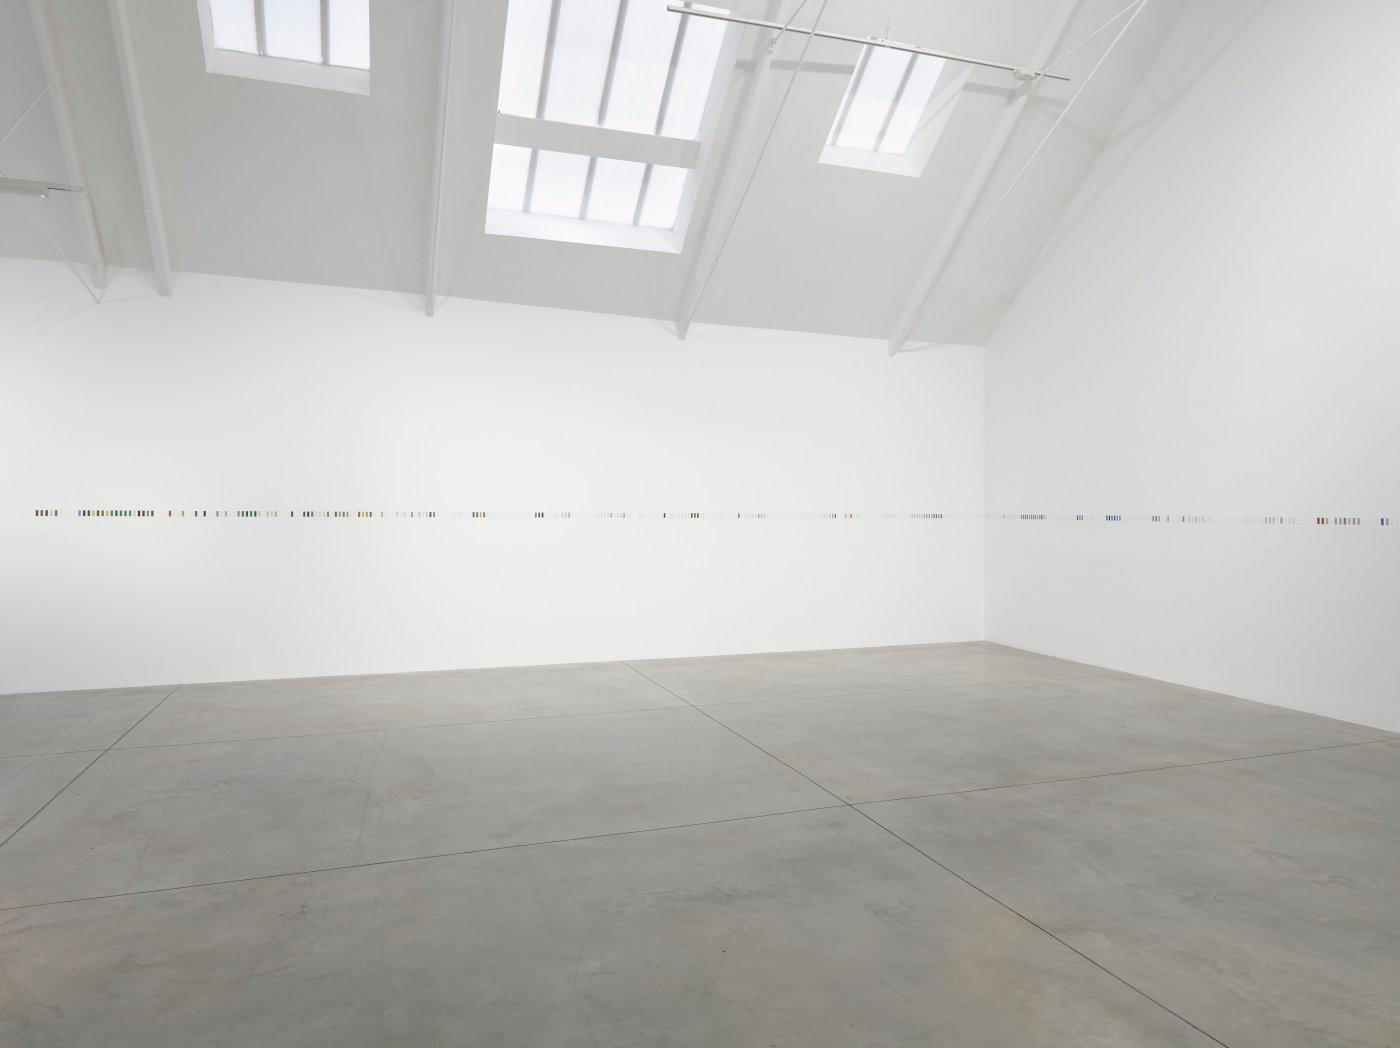 Lisson Gallery Bell Street Spencer Finch 6